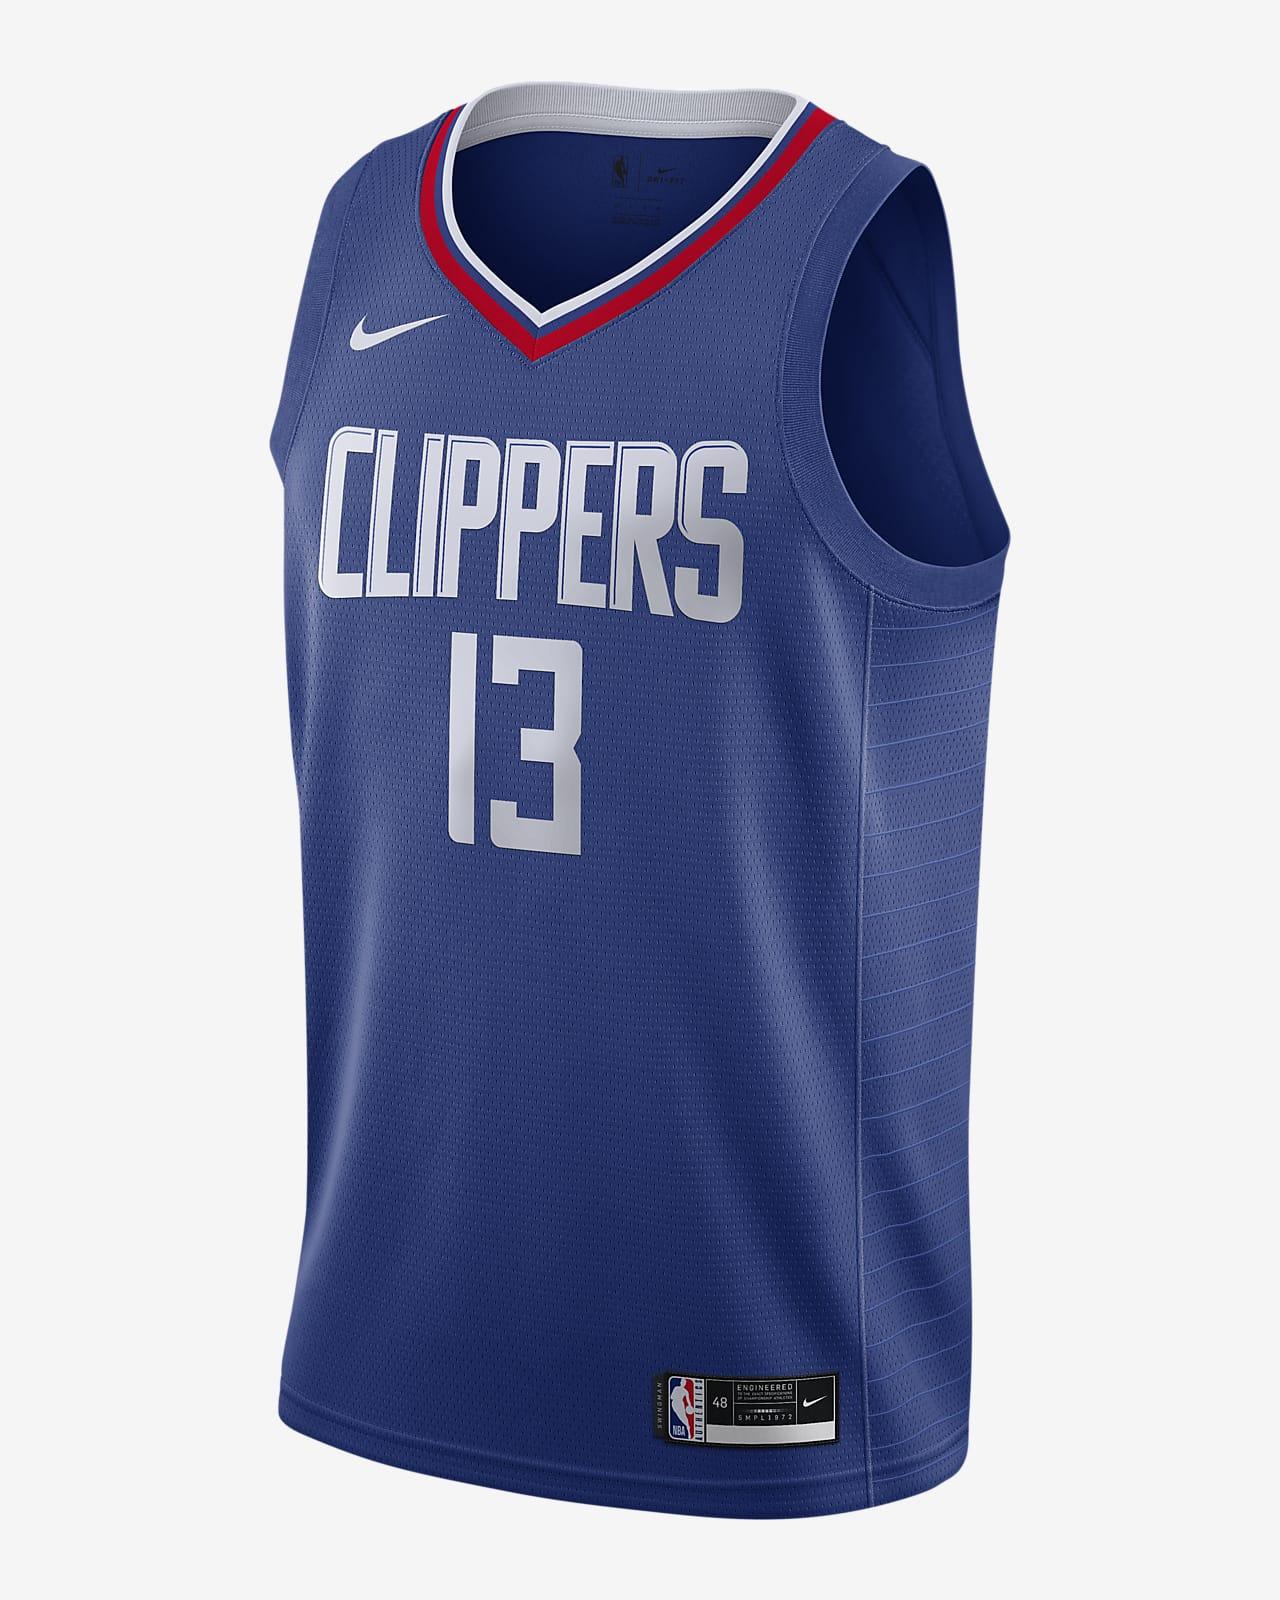 2020 赛季洛杉矶快船队 (Paul George) Icon Edition Nike NBA Swingman Jersey 男子球衣